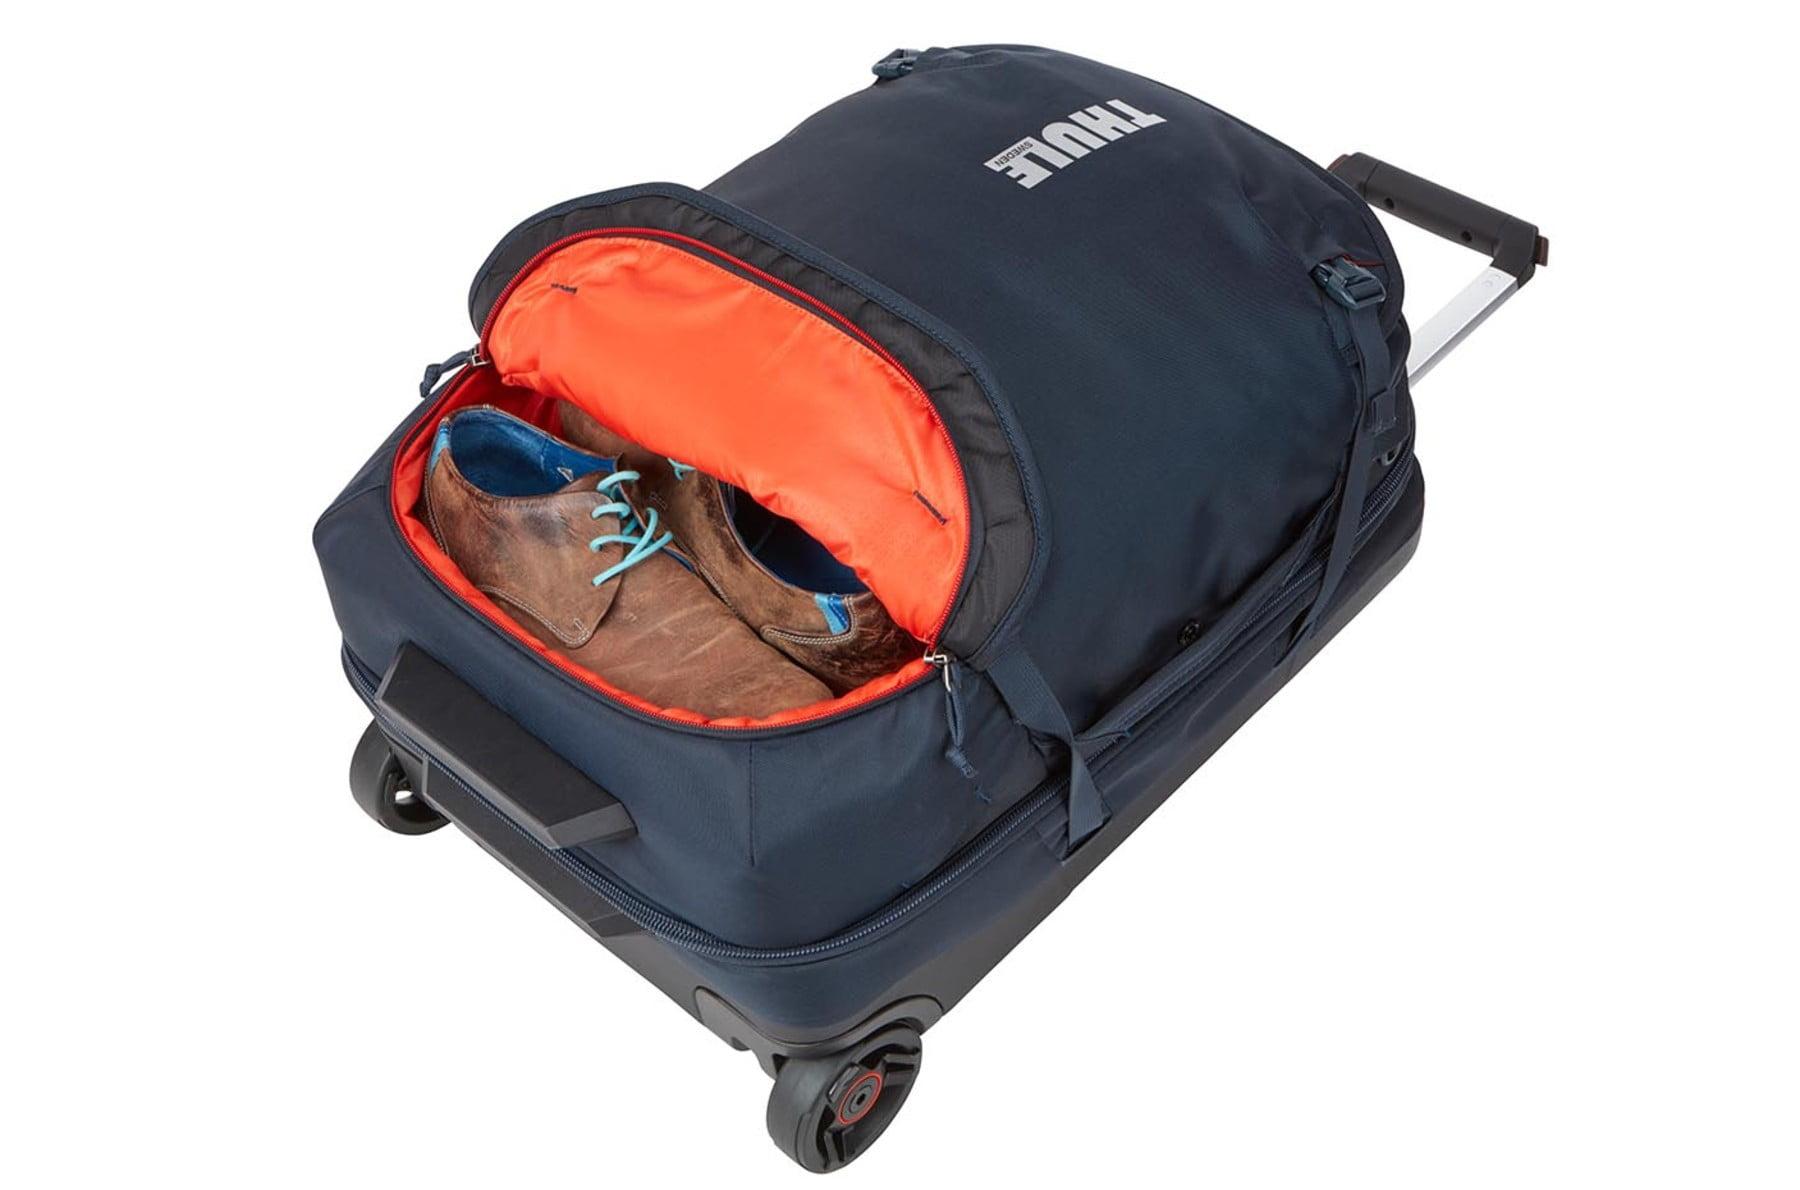 Geanta voiaj Thule Subterra Luggage 55cm22 Mineral 6